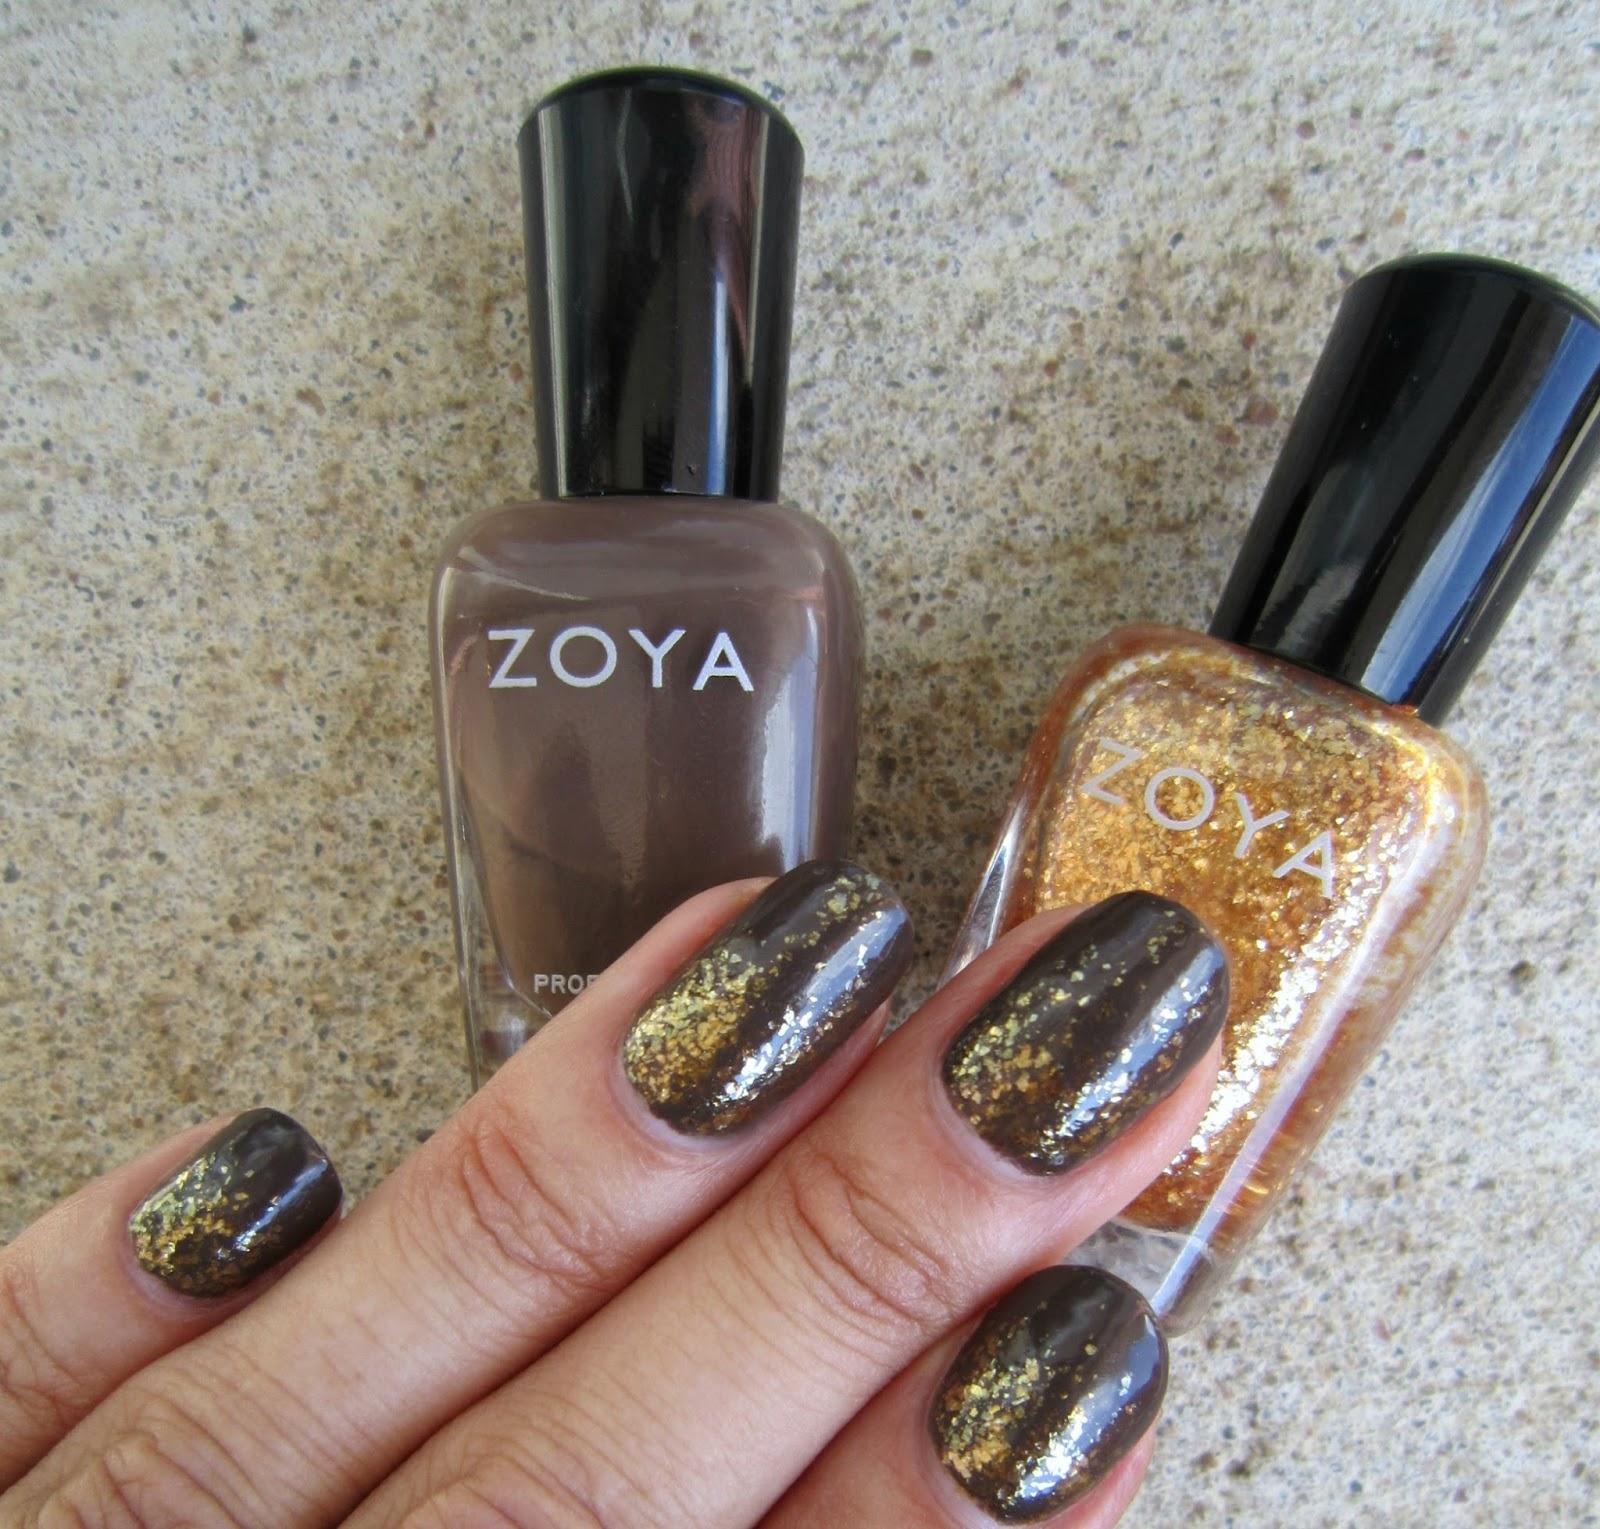 Concrete And Nail Polish Striped Nail Art: Concrete And Nail Polish: Gradient With Zoya Emilia